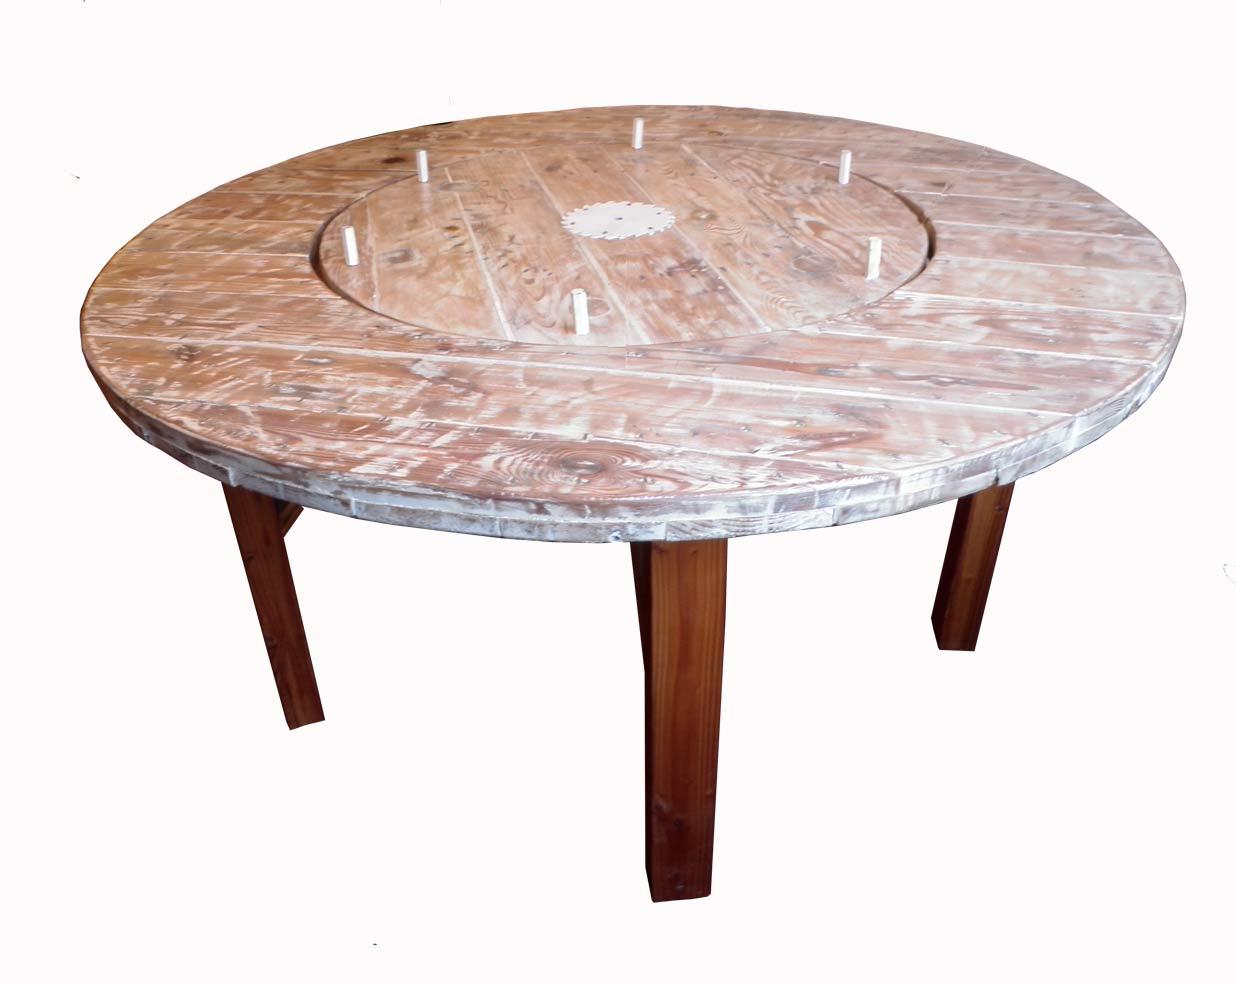 malenis furniture tisch 1 website klein. Black Bedroom Furniture Sets. Home Design Ideas